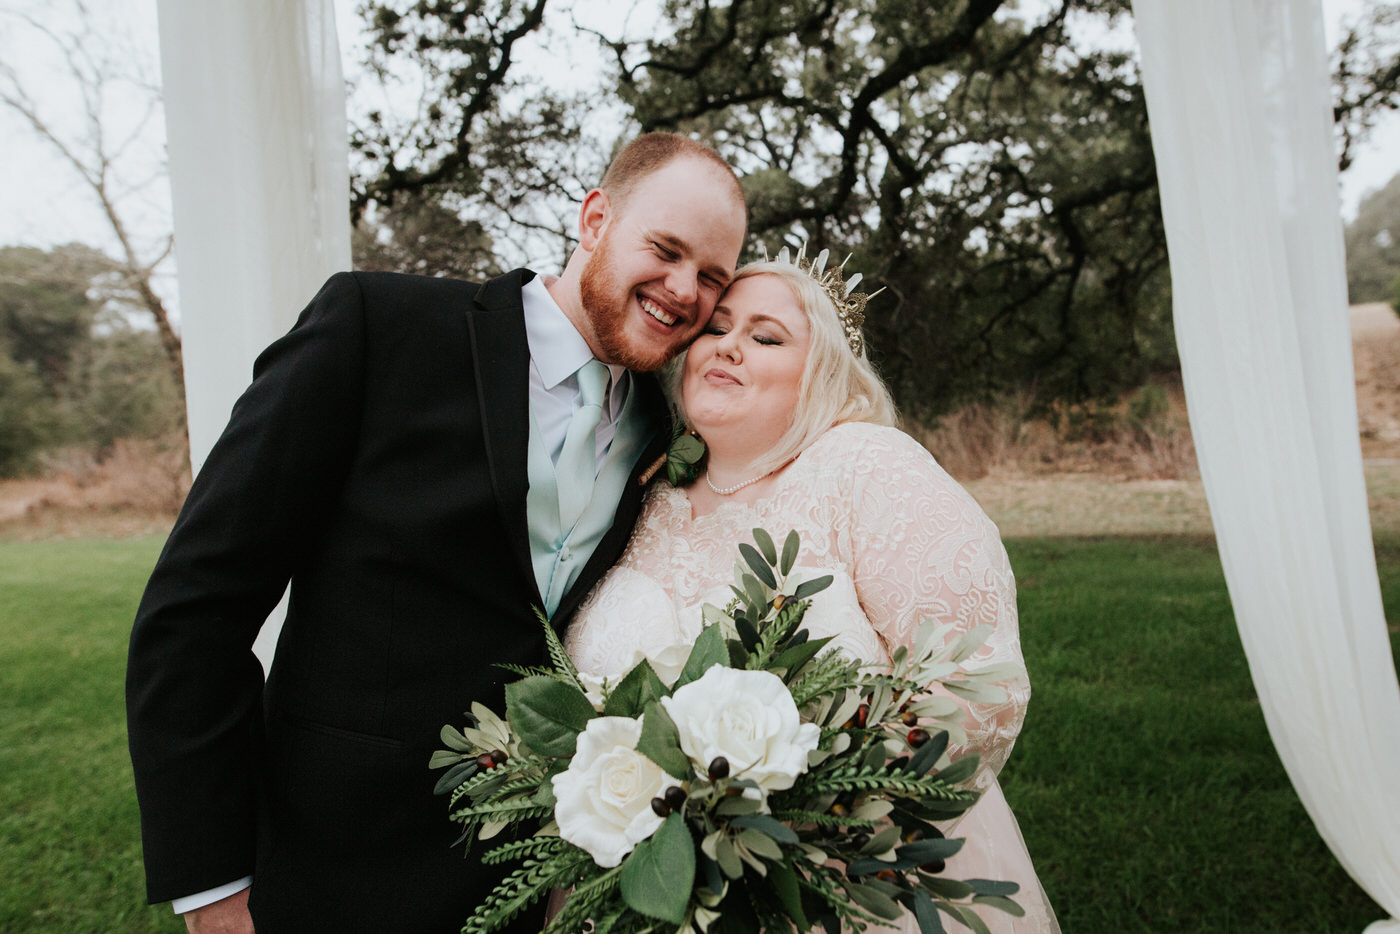 Bride with wedding guest at Austin wedding